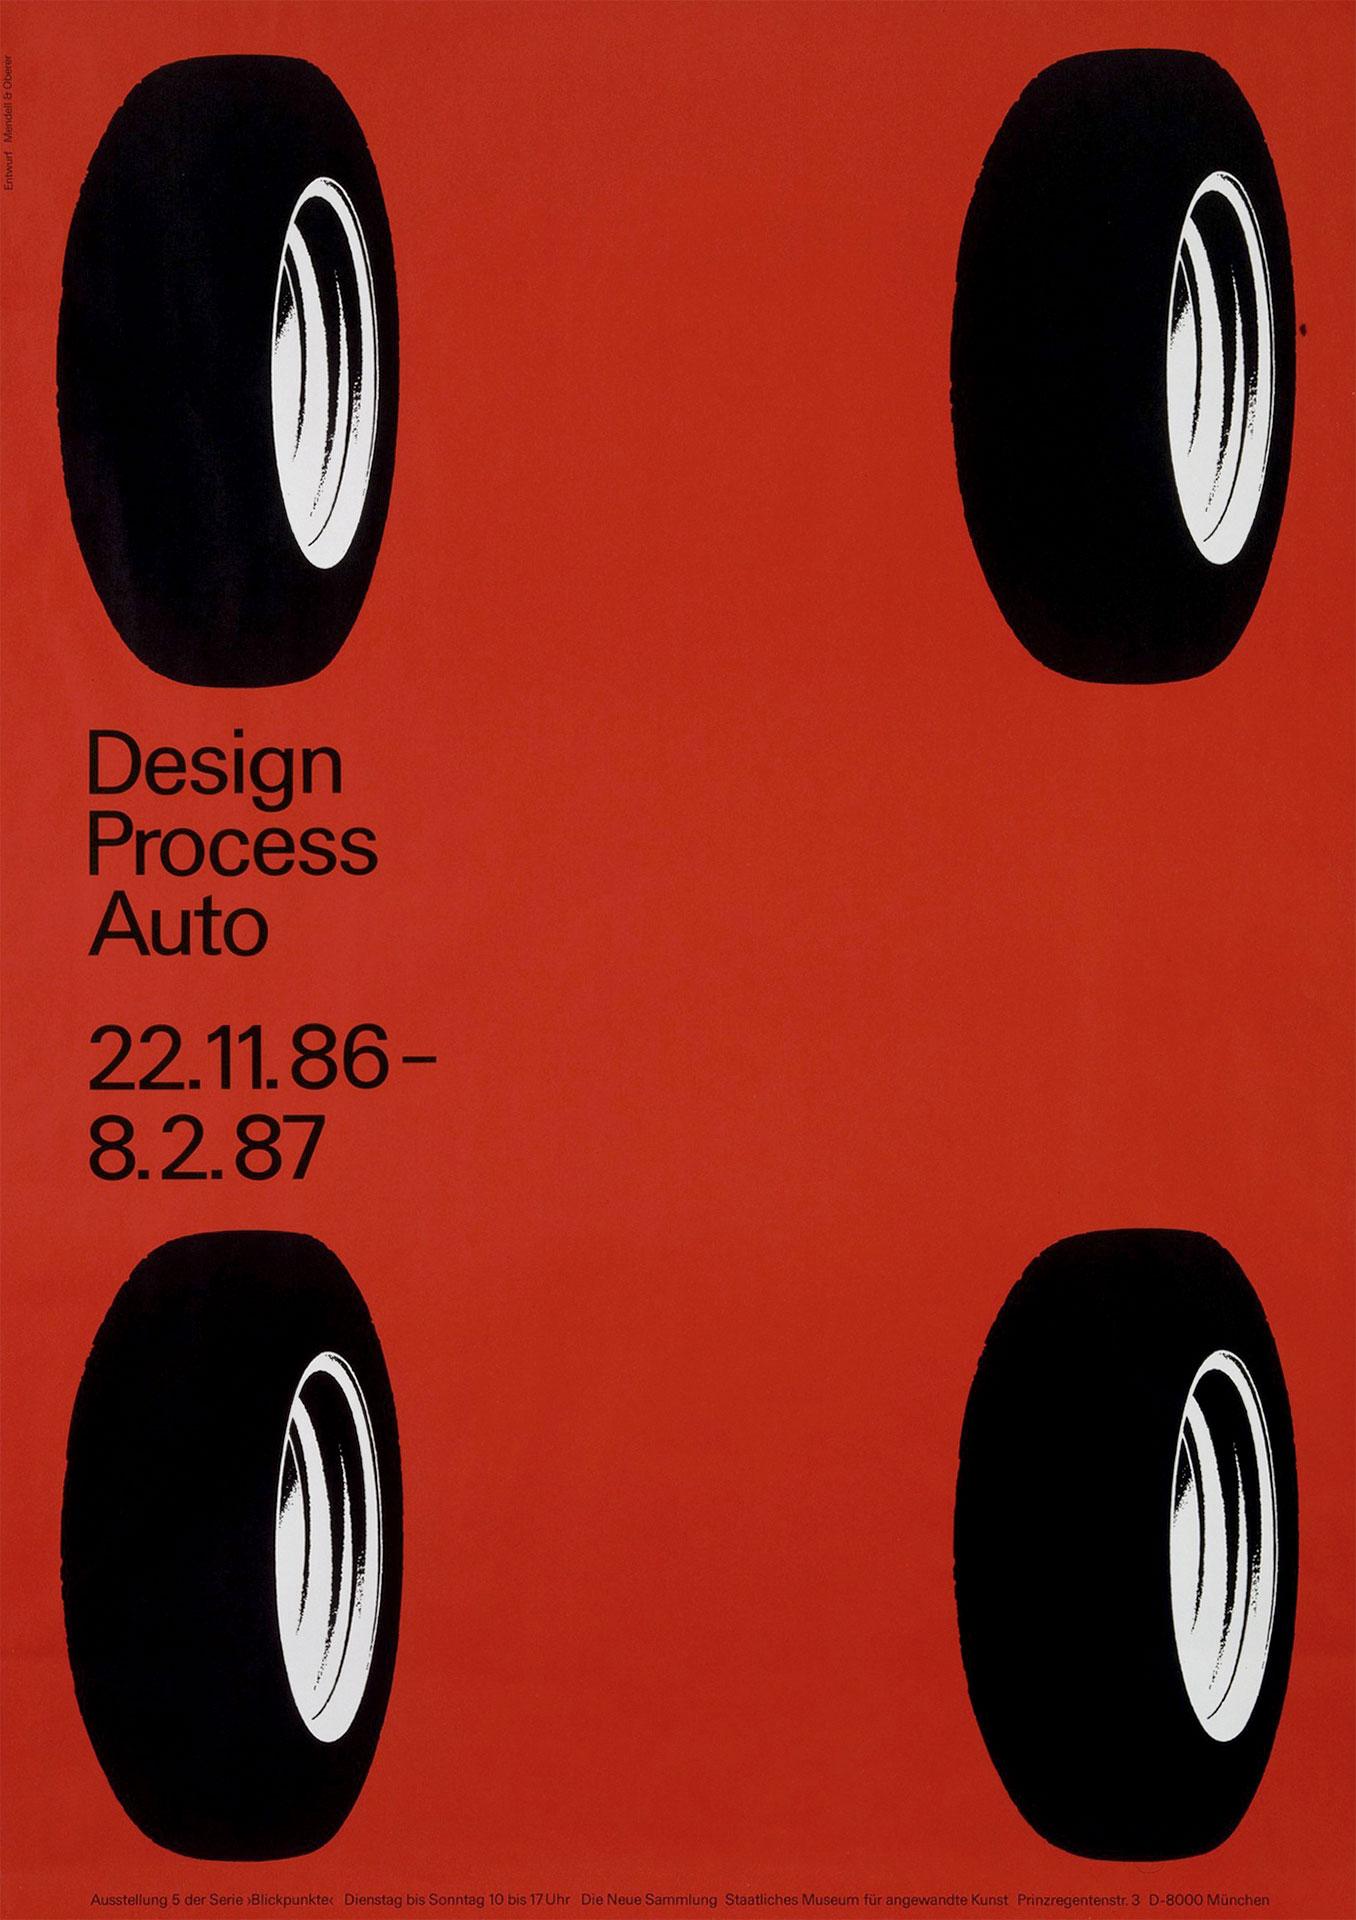 Design-Process-Auto.jpg